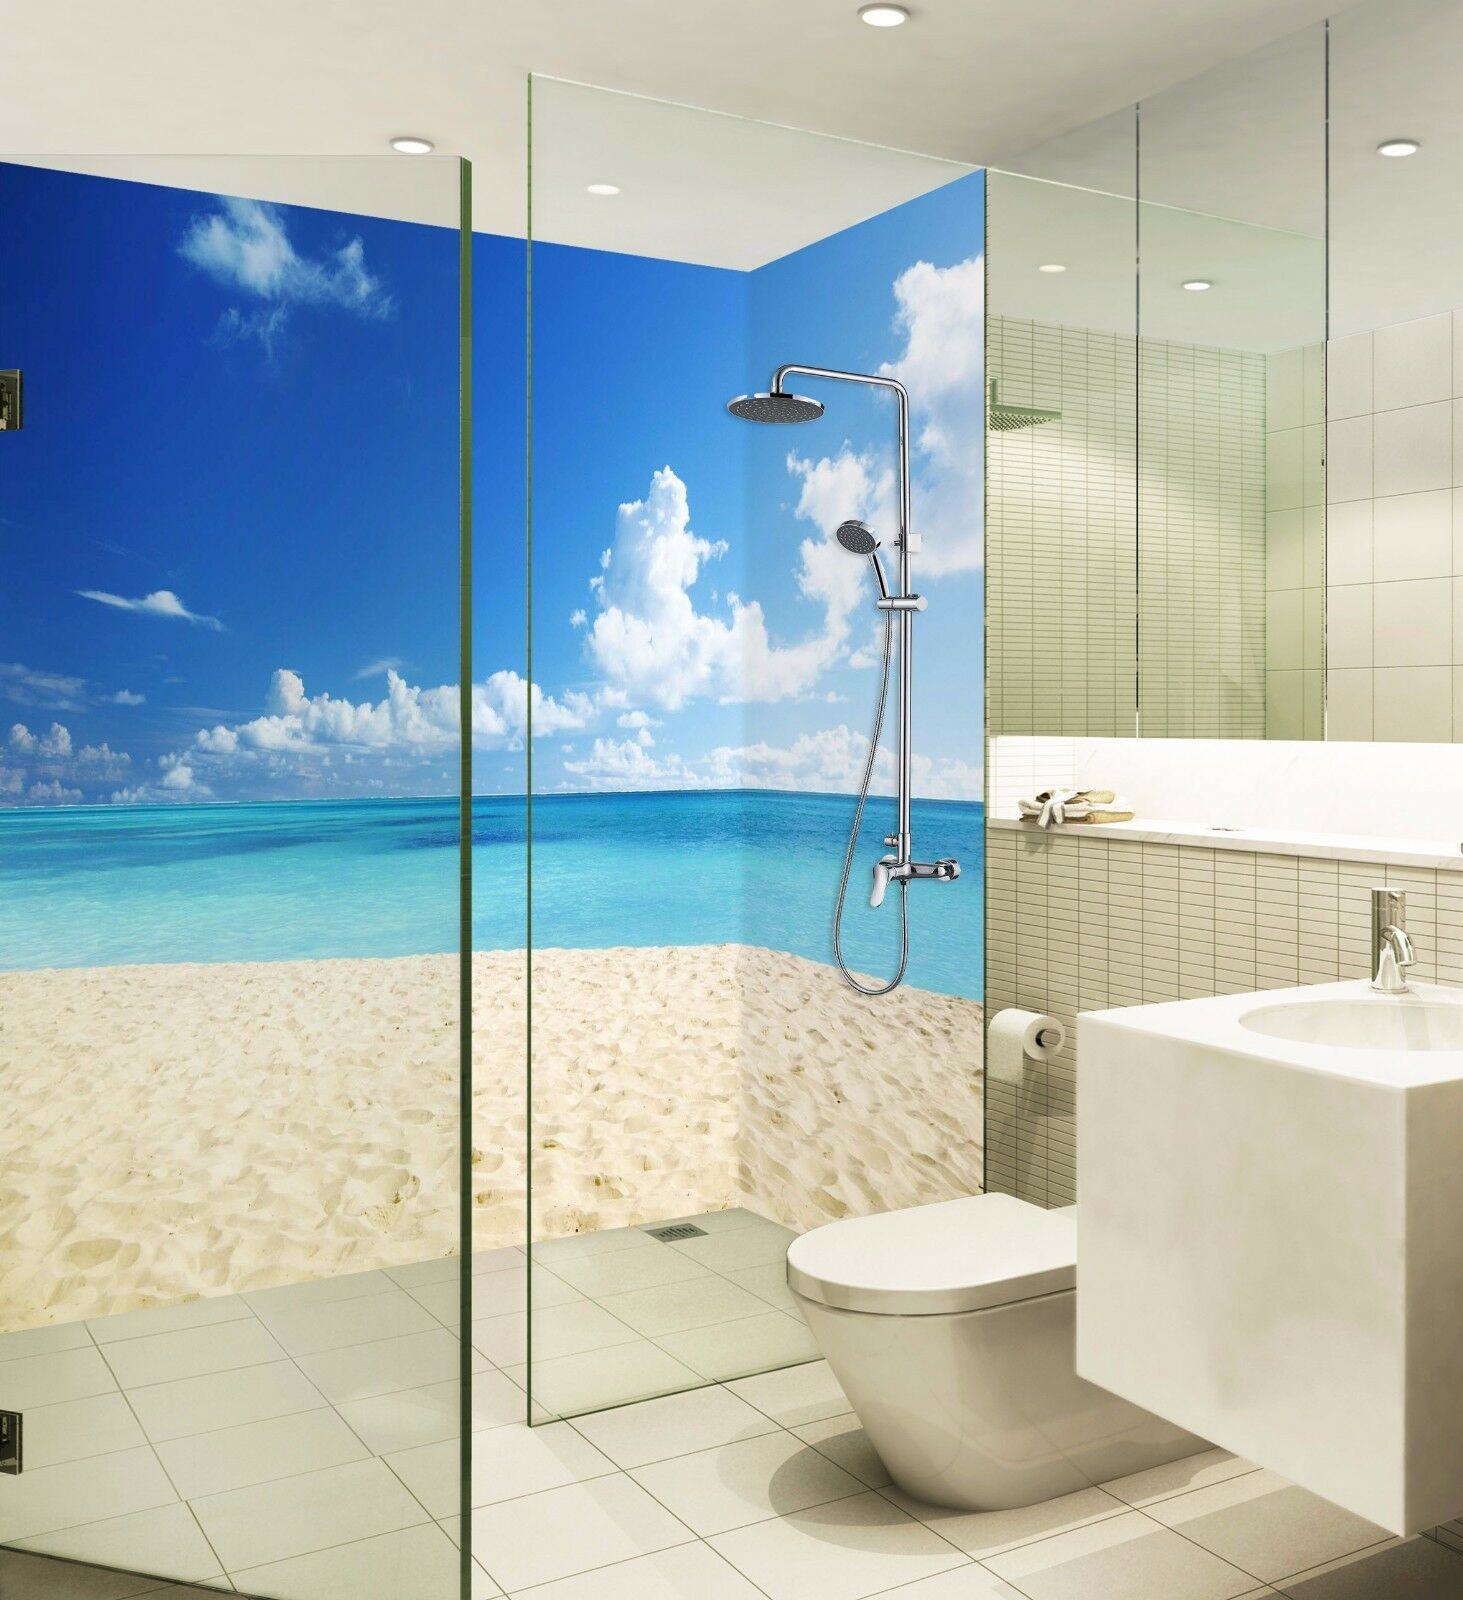 3D Beach Ocean Sky 7 WallPaper Bathroom Print Decal Wall Deco AJ WALLPAPER UK